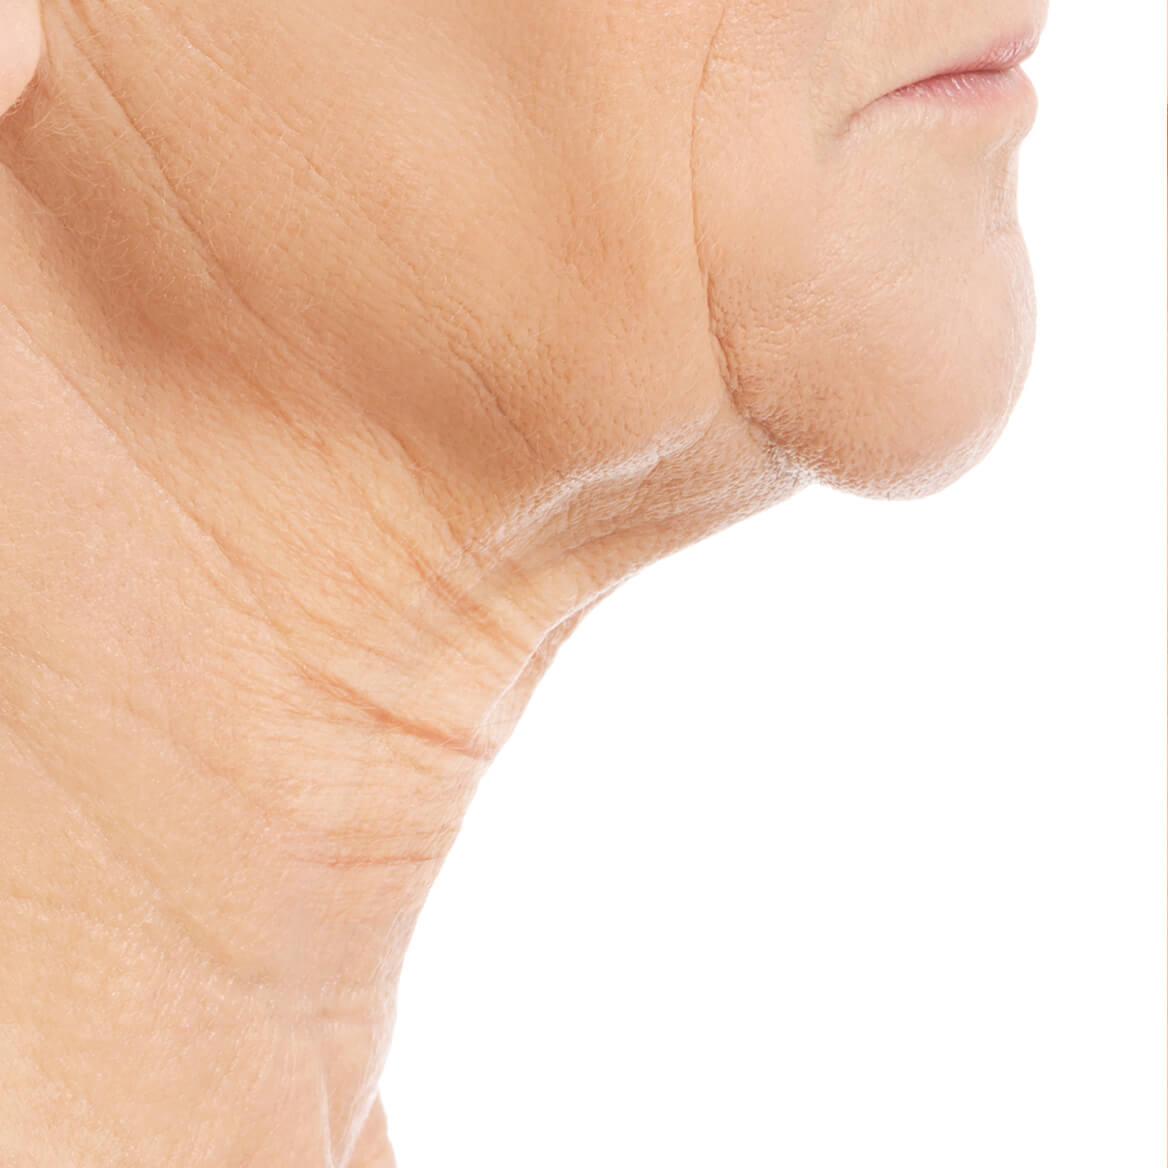 Crepe Be Gone Skin Firming Collagen Chin Masks Set of 2-370686